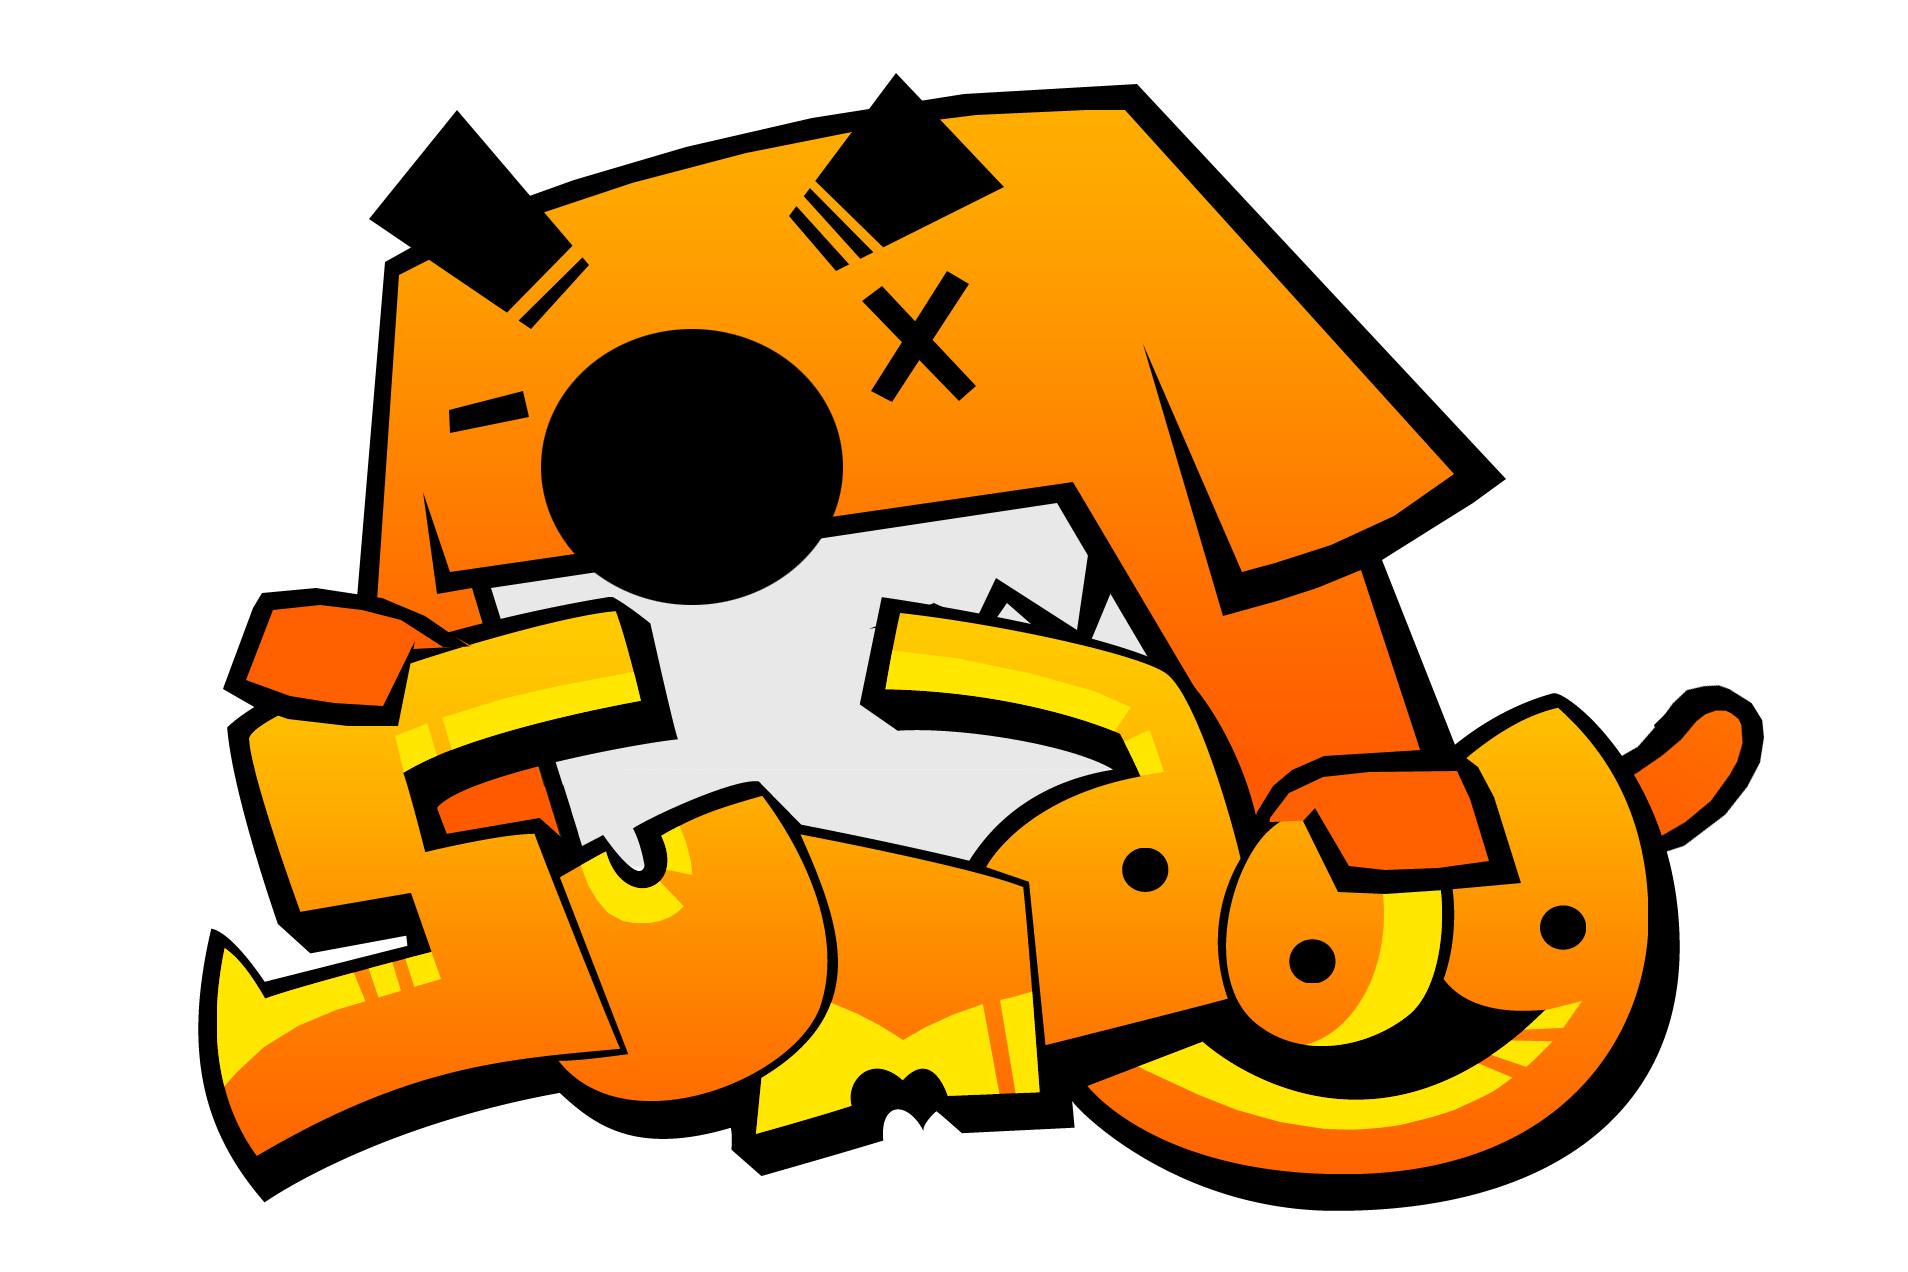 Sumdog company logo